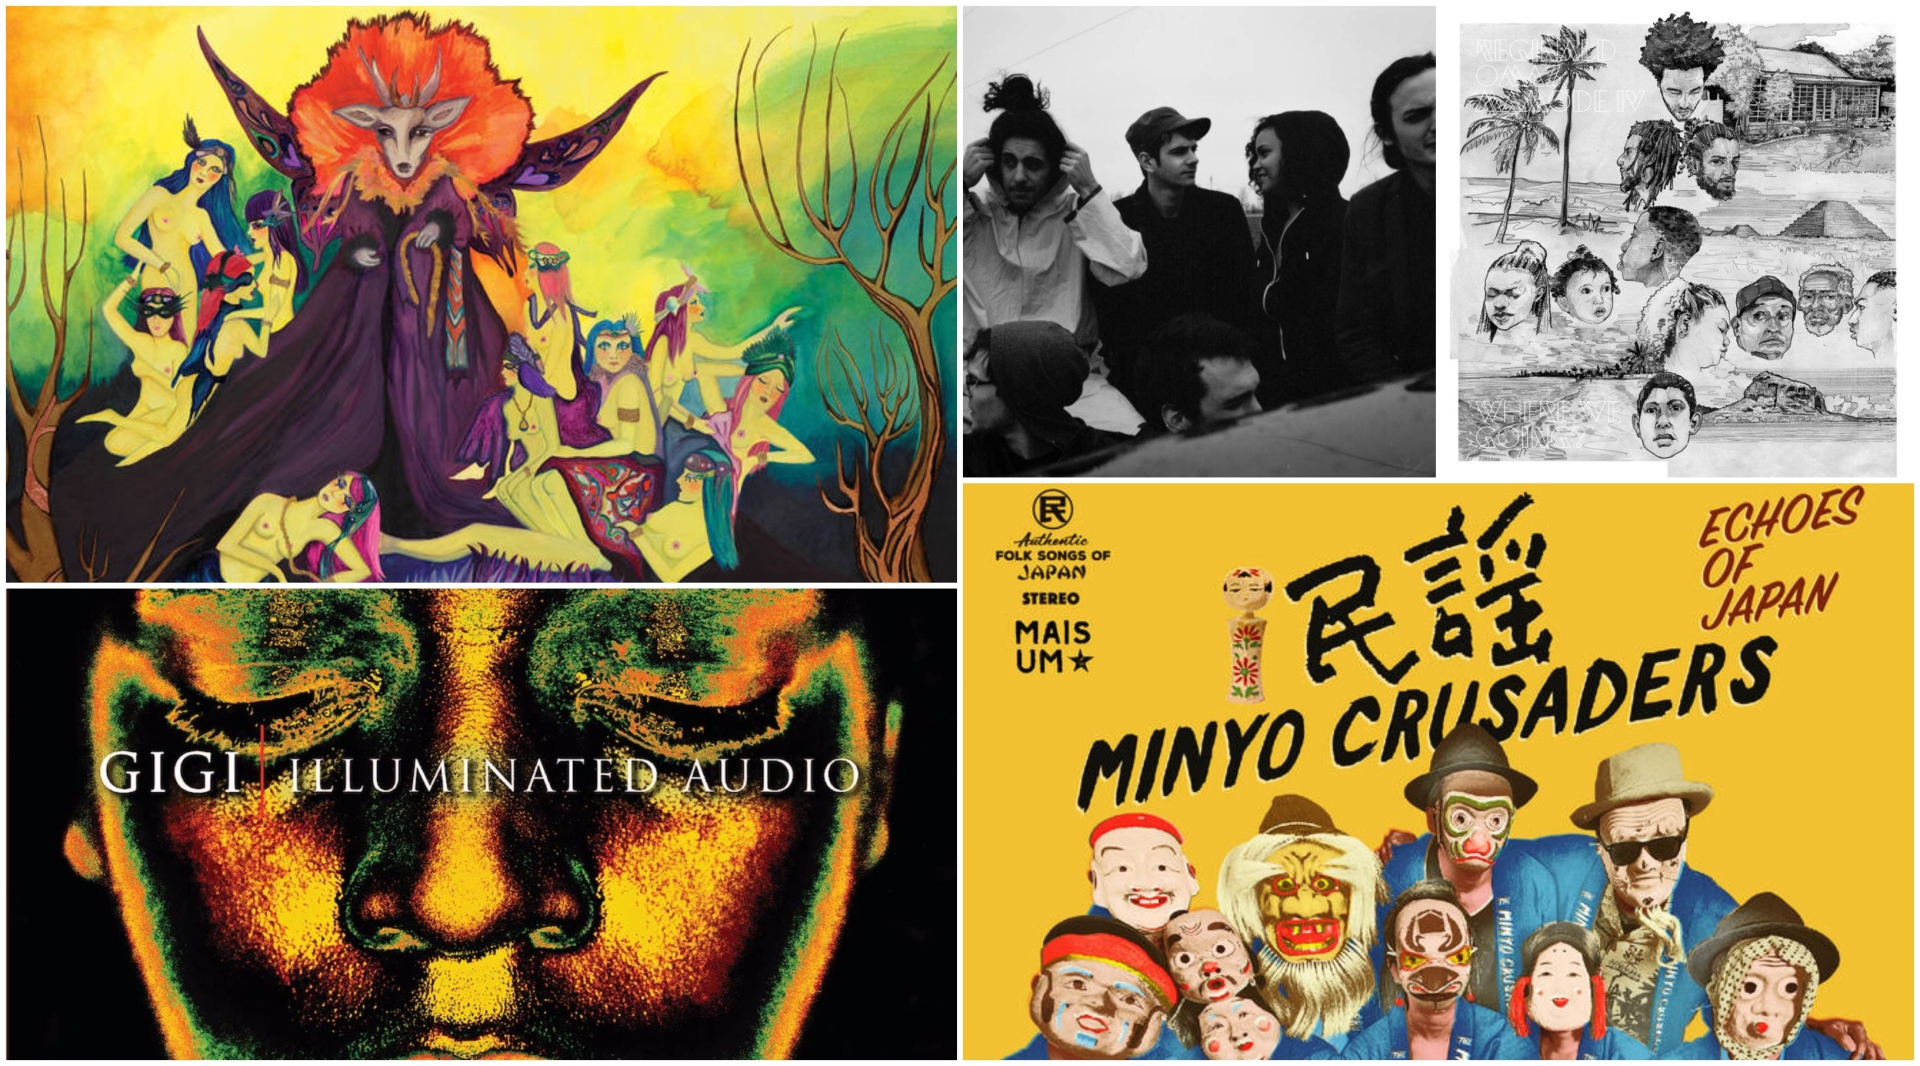 "New albums from Schemes, Reginald Omas Mamode IV, Gigi ""Illuminated Audio, Greg Foat, and Minyo Crusaders."